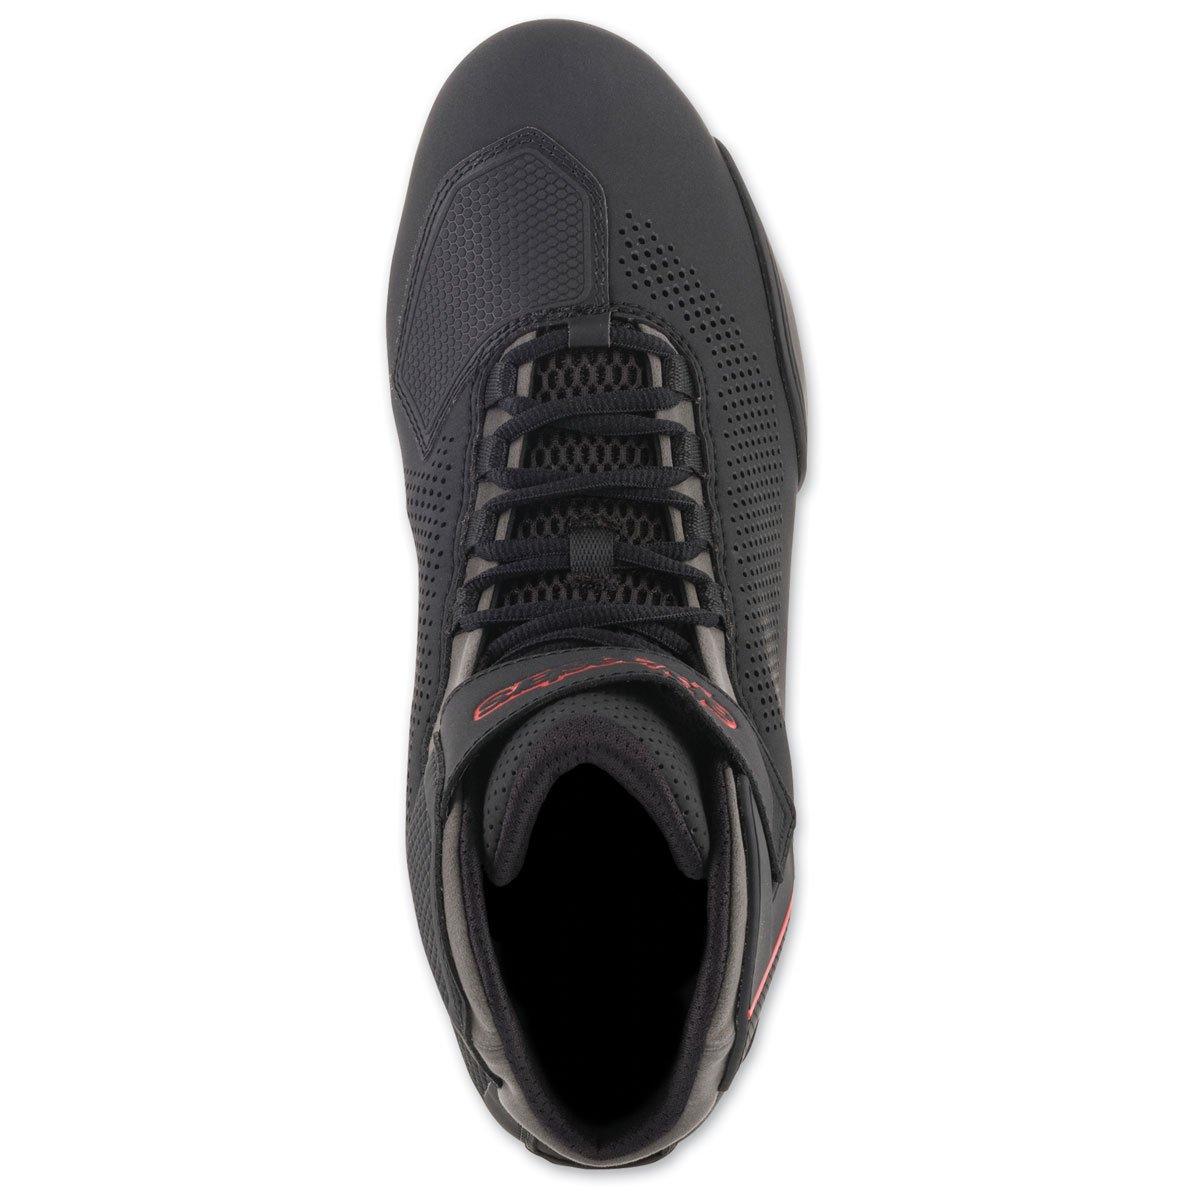 Alpinestars Mens 251561813110 Shoe Black//Grey//Red Size 10